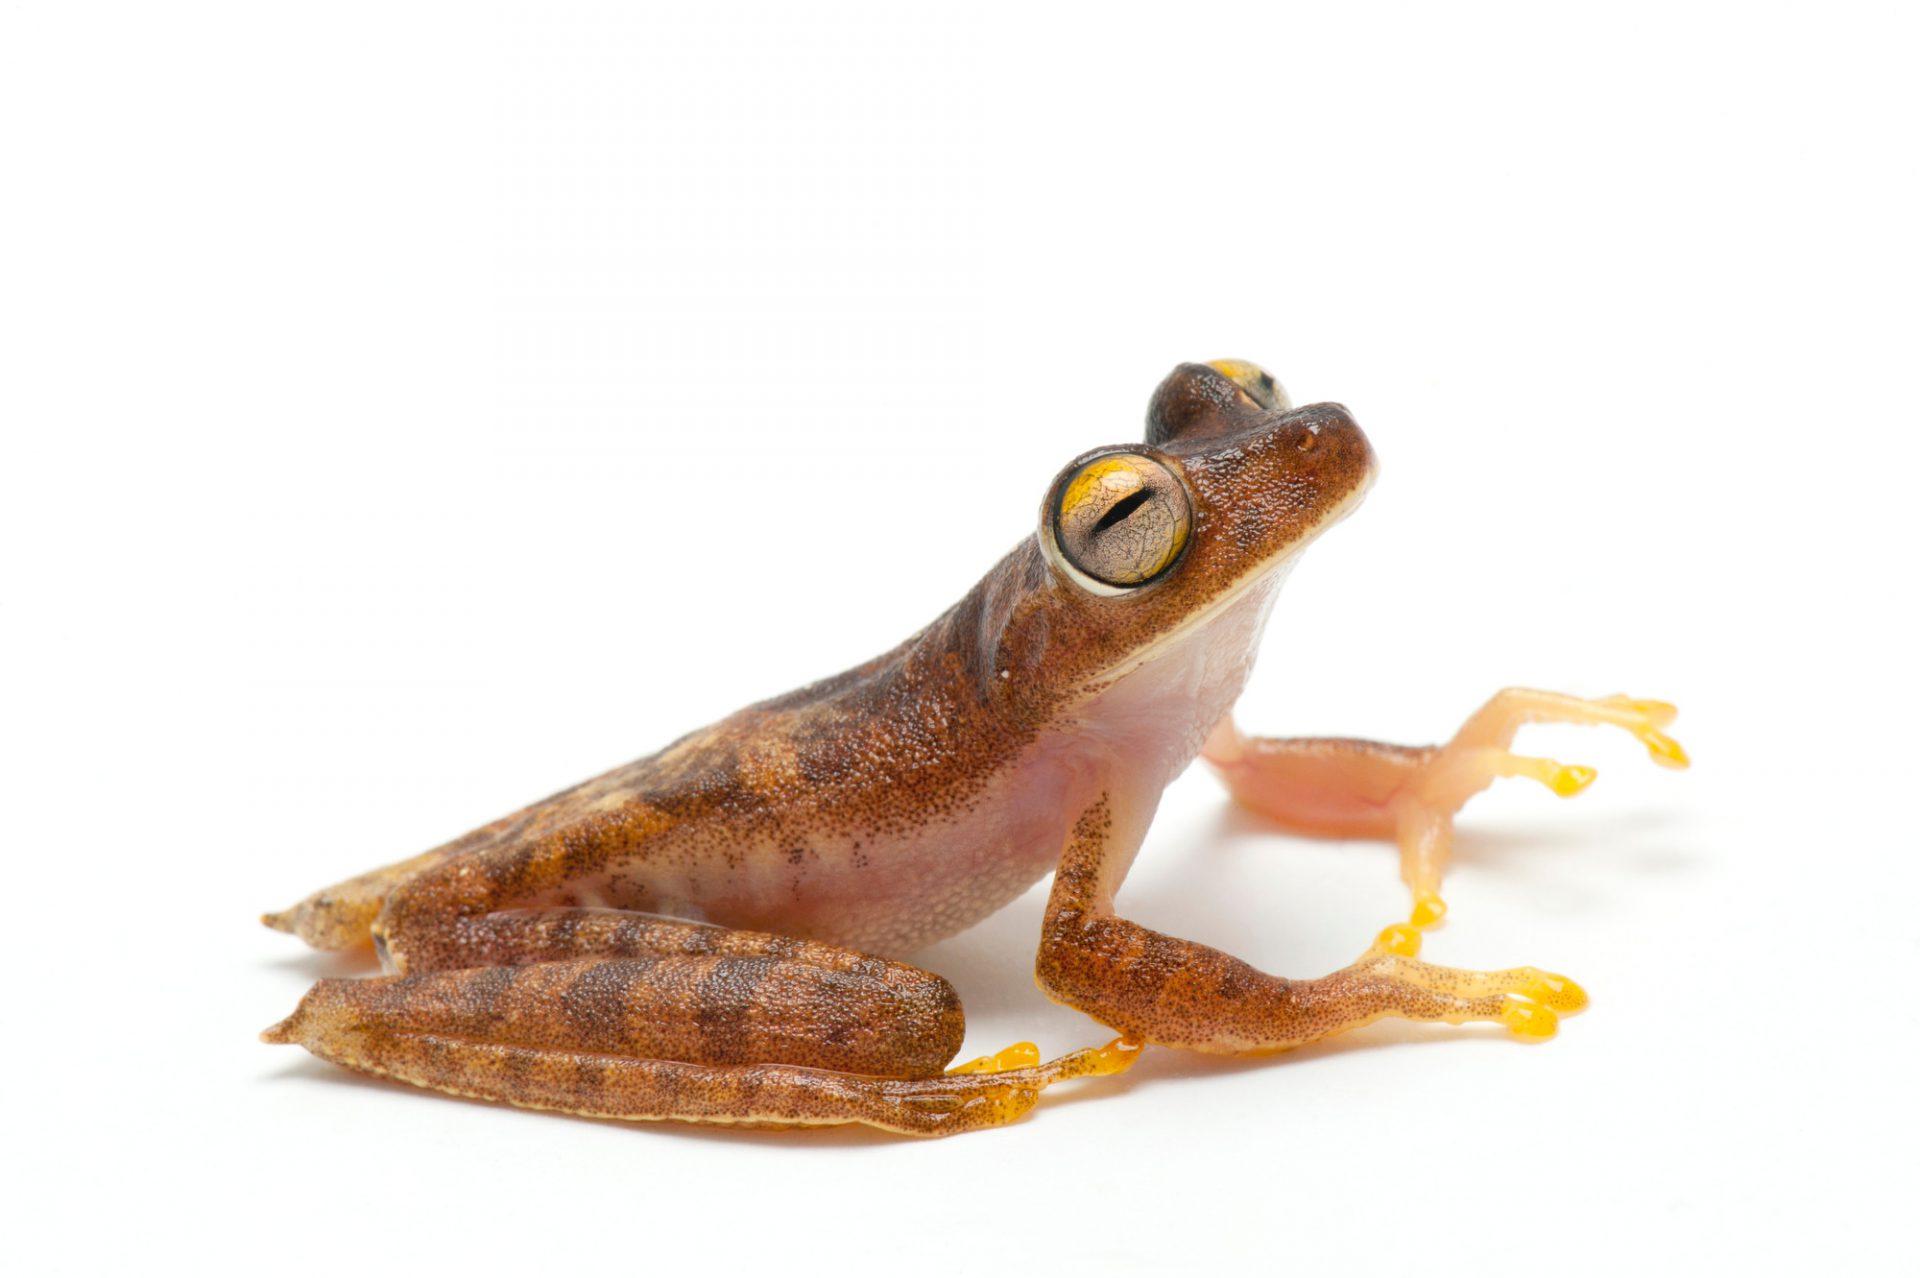 A Gunther's banded treefrog, Hypsiboas fasciatus.